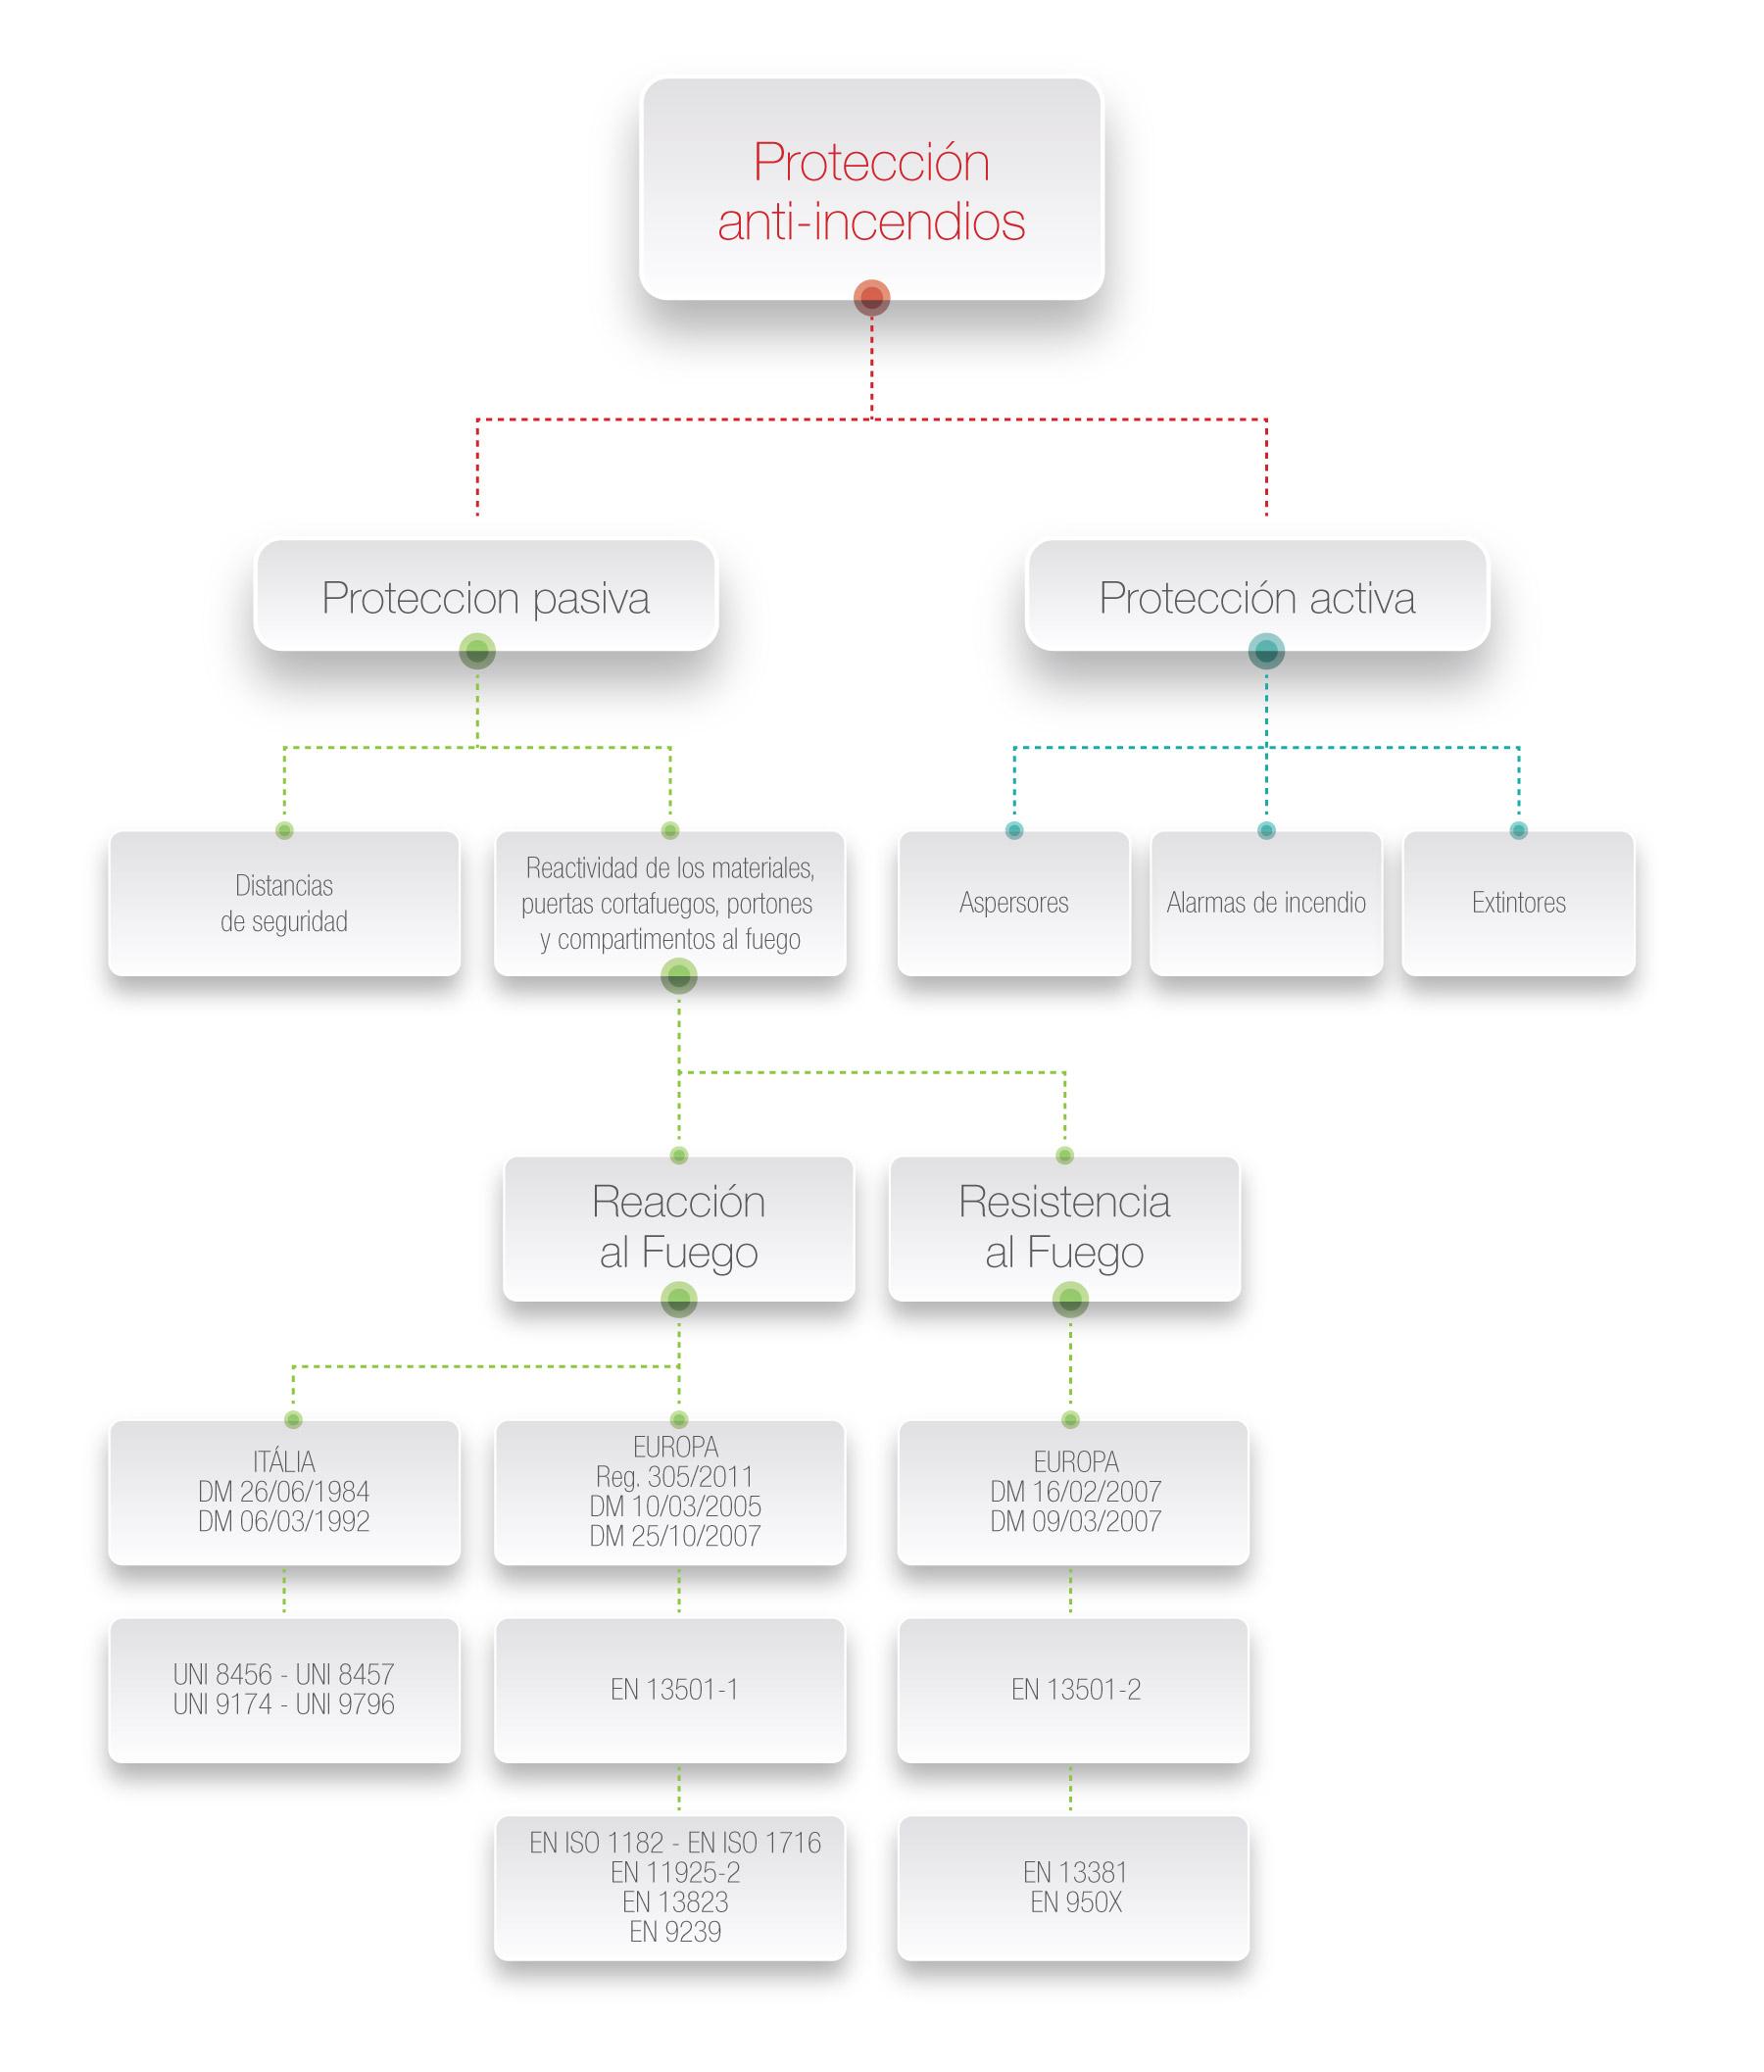 quadro_normativo_web_es